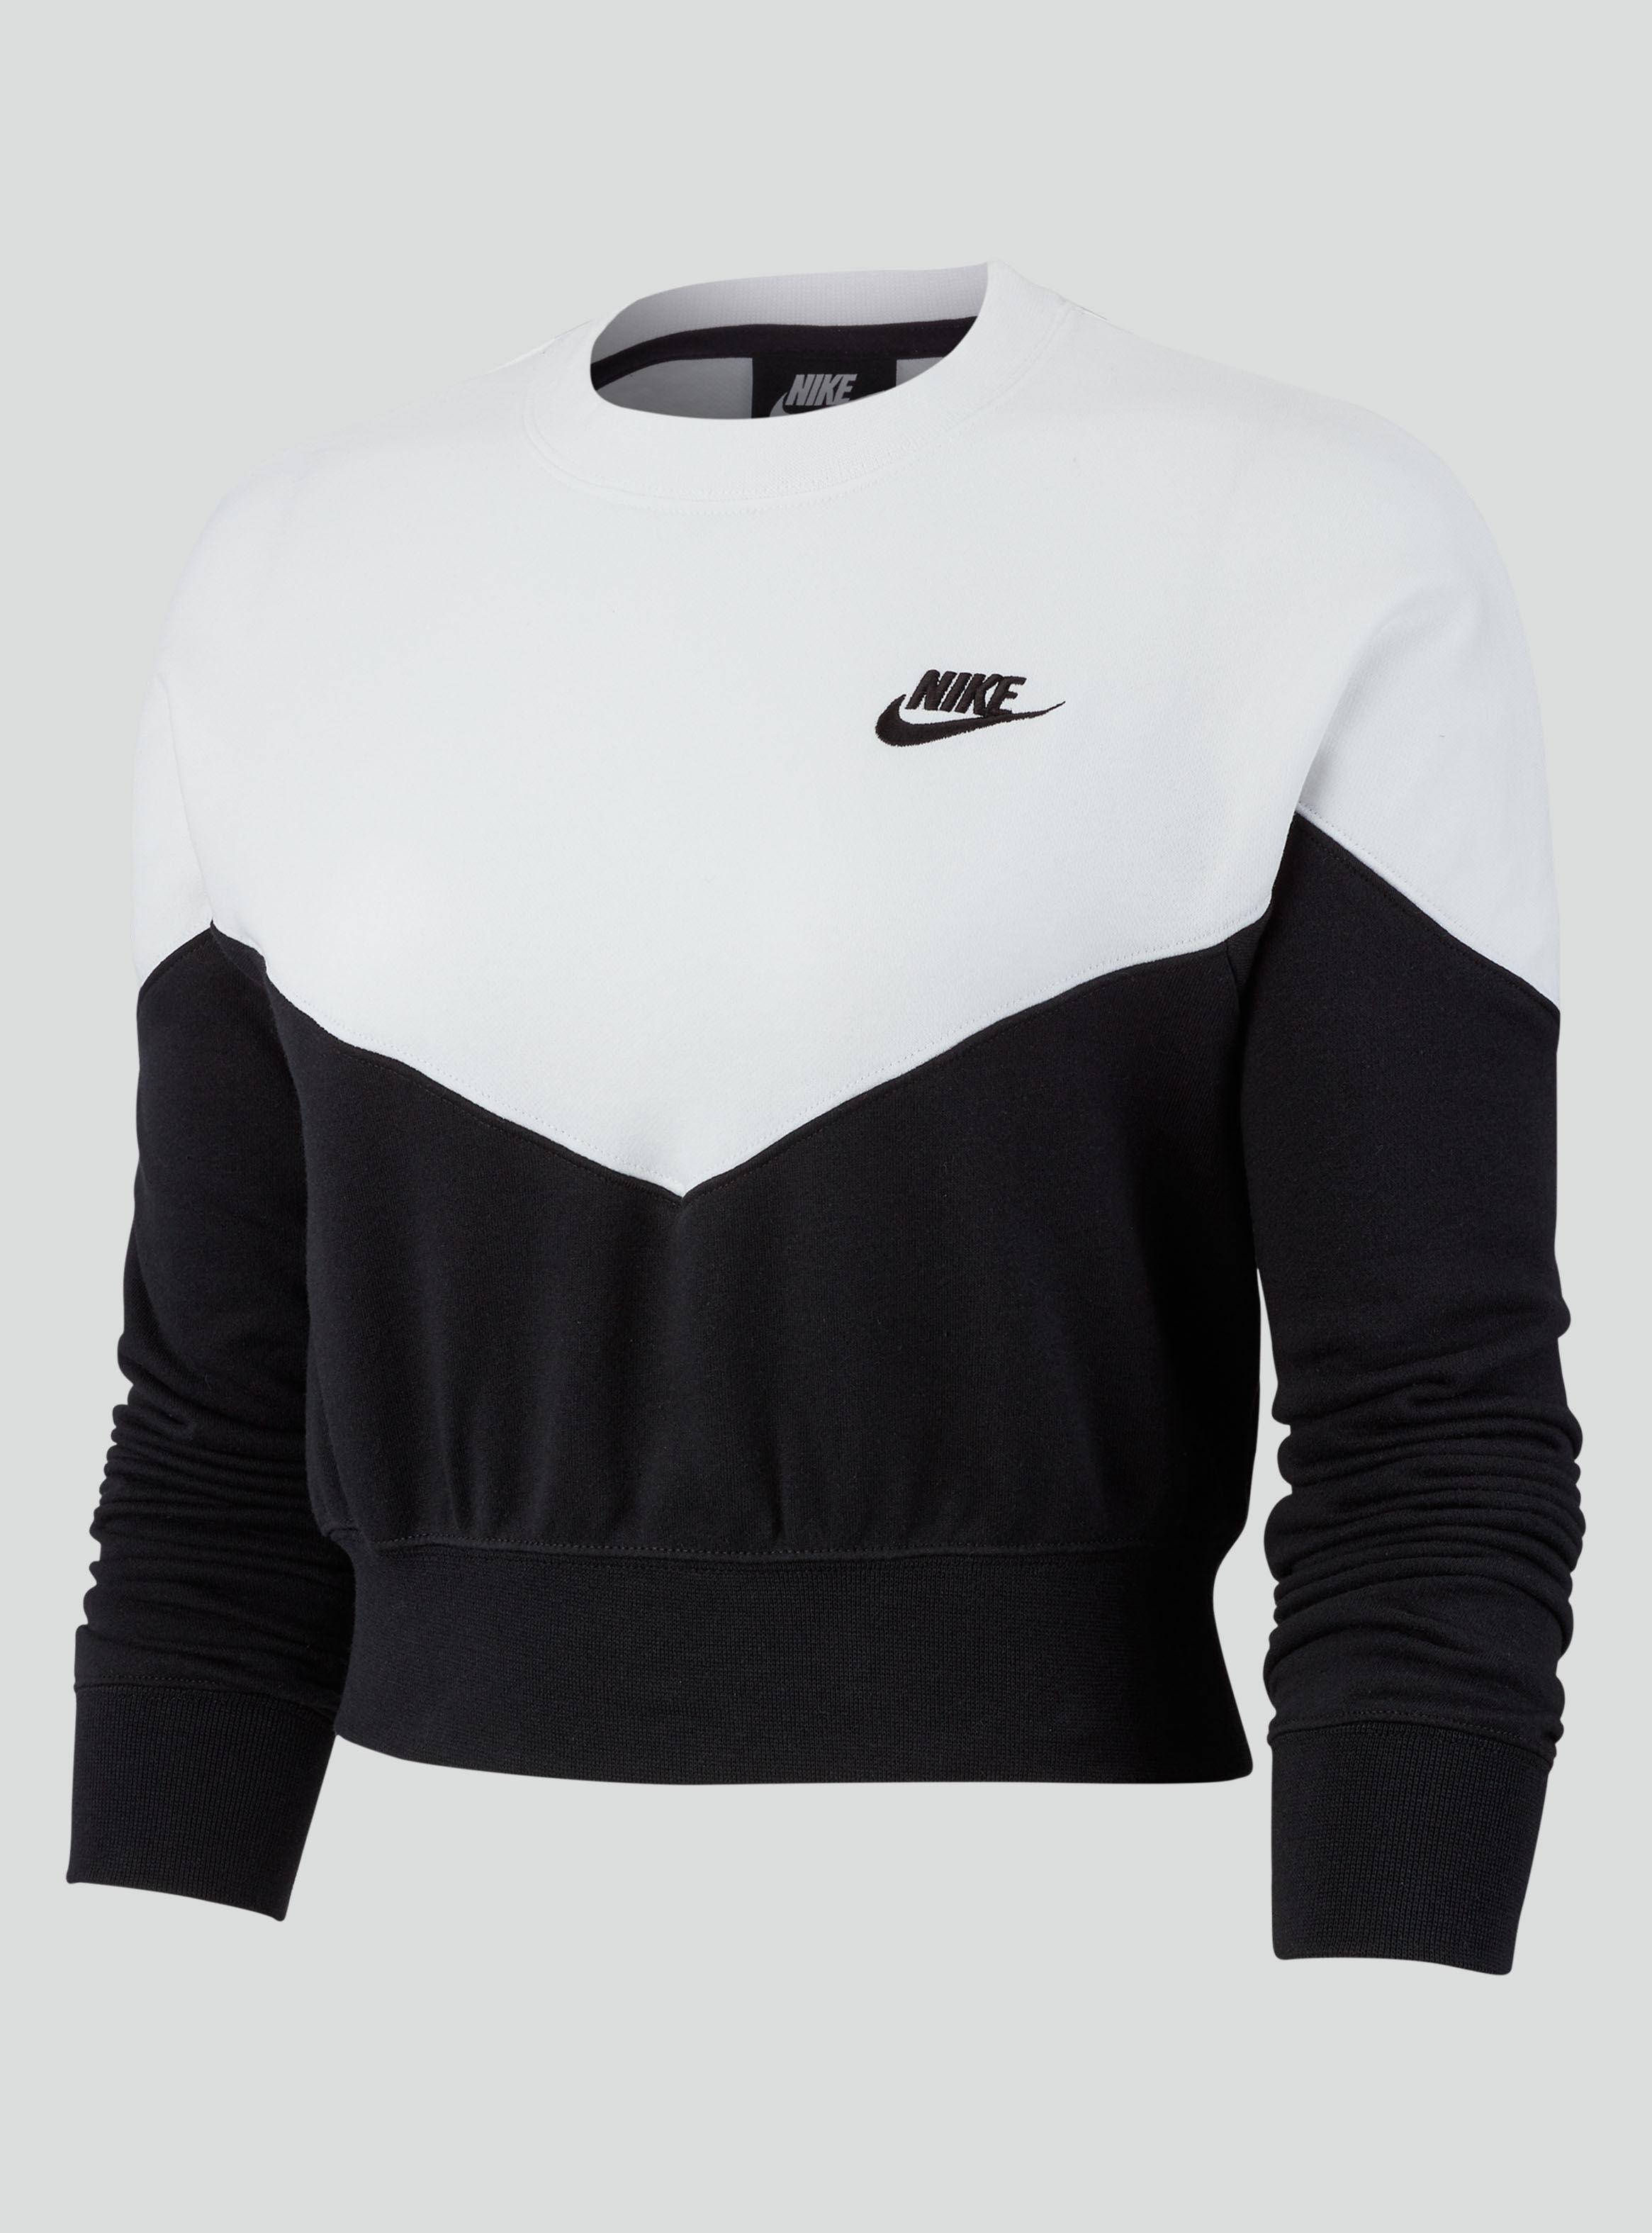 Polerón Nike Sportswear Manga Larga Mujer